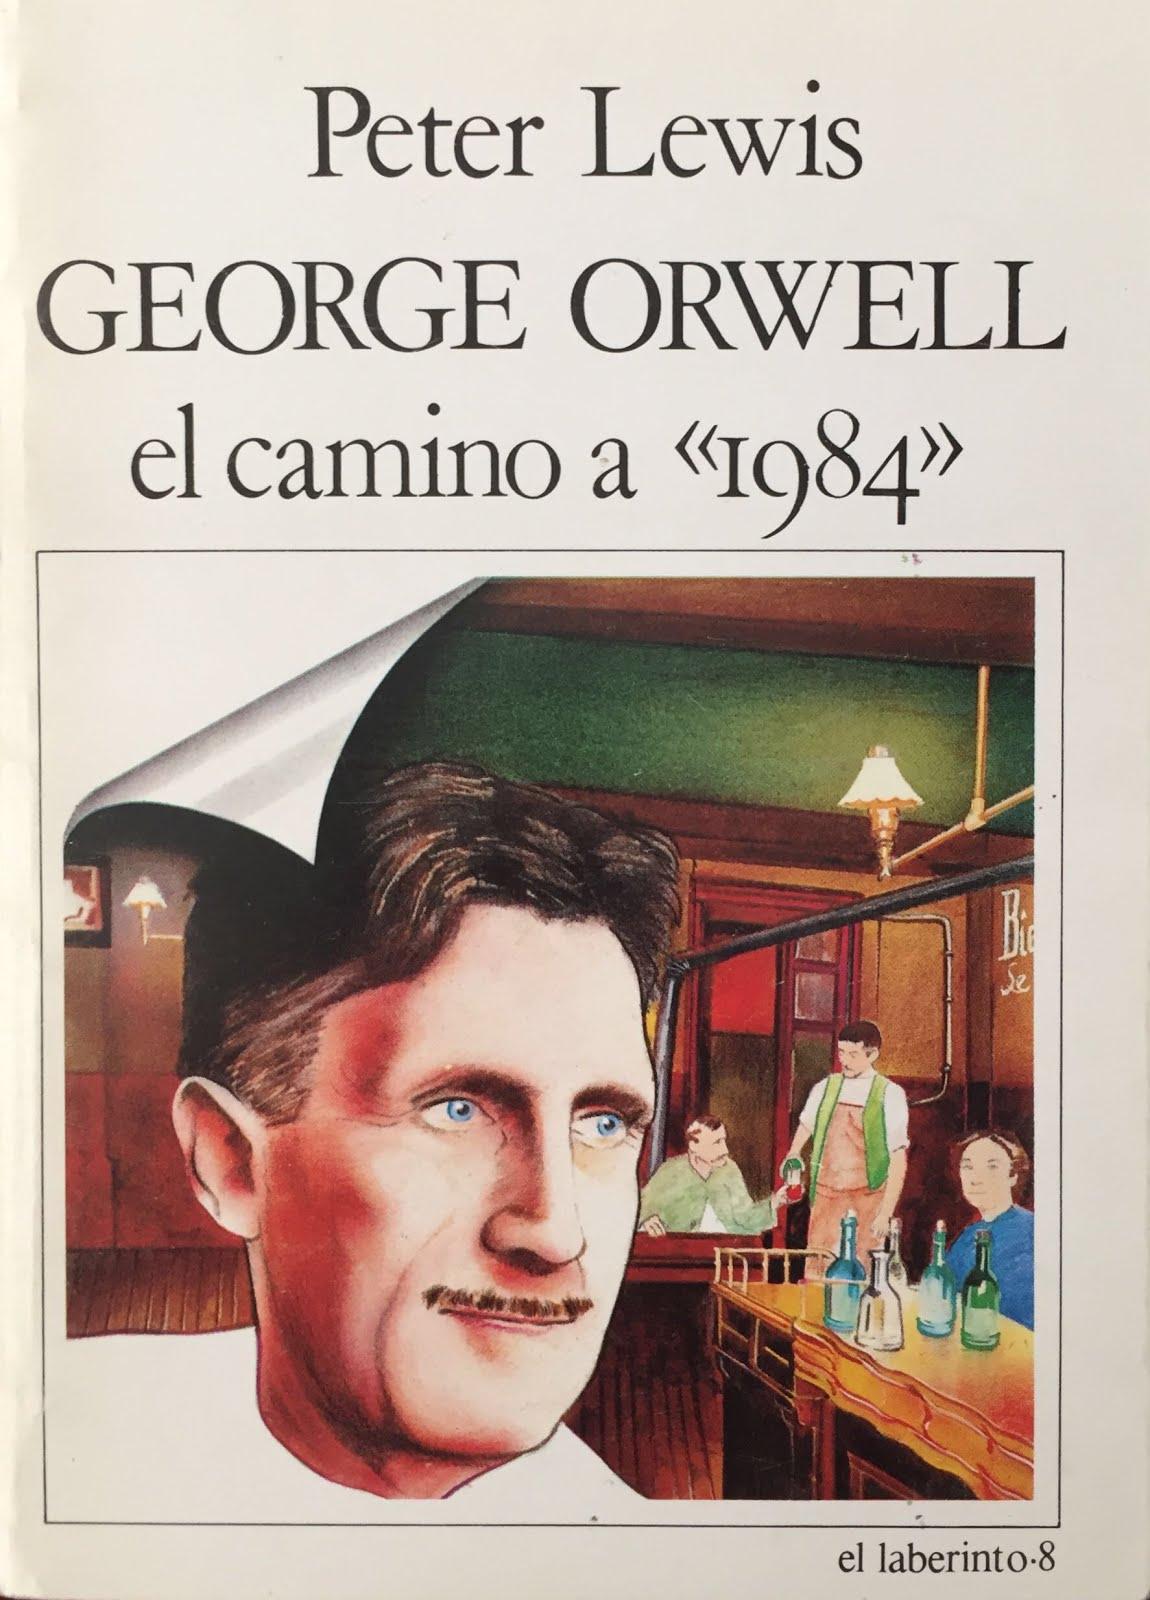 George Orwell el camino a '1984'